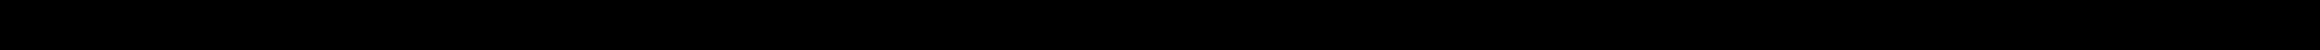 HJS 1K0.254.506 LX, 1K0.254.508 FX, 1K0.254.508 PX, 1K0.254.506 LX, 1K0.254.508 FX Katalyzátor